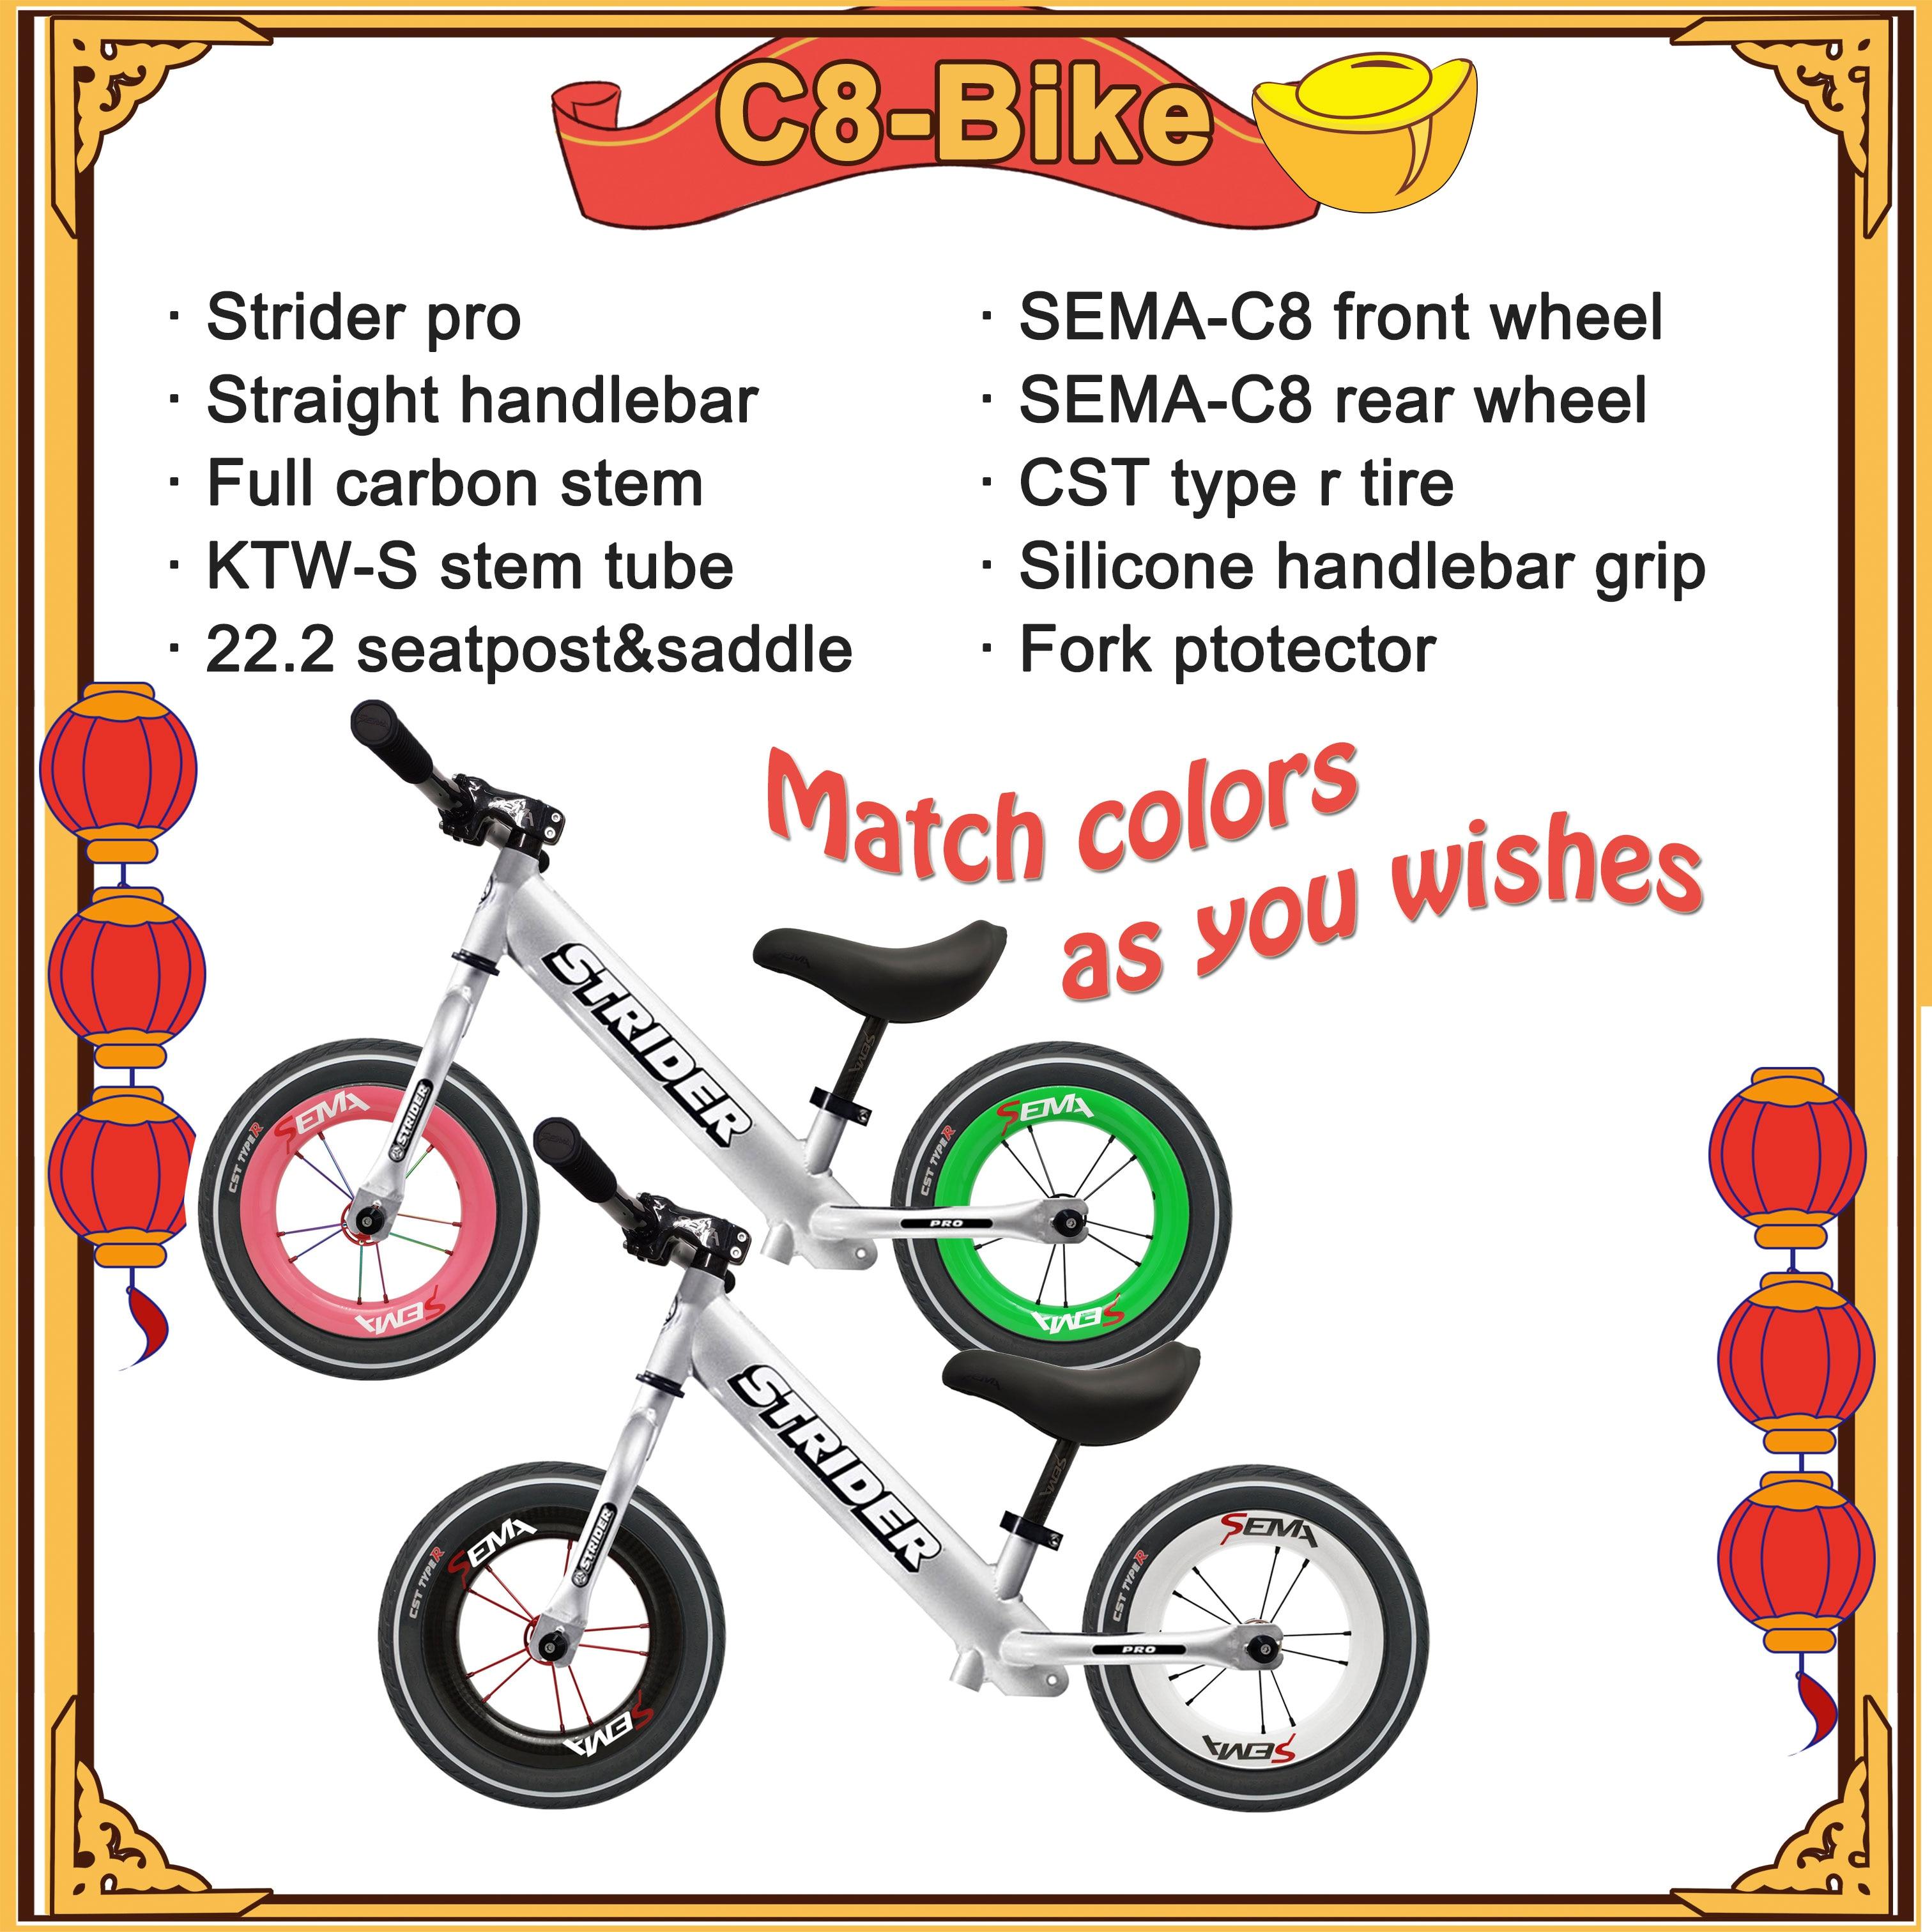 New Upgrade Striders Bike -C8 Set With Carbon Parts Balance Bike Push Bike With Carbon Wheels Handlebar Seatpost Whole Bike Sale